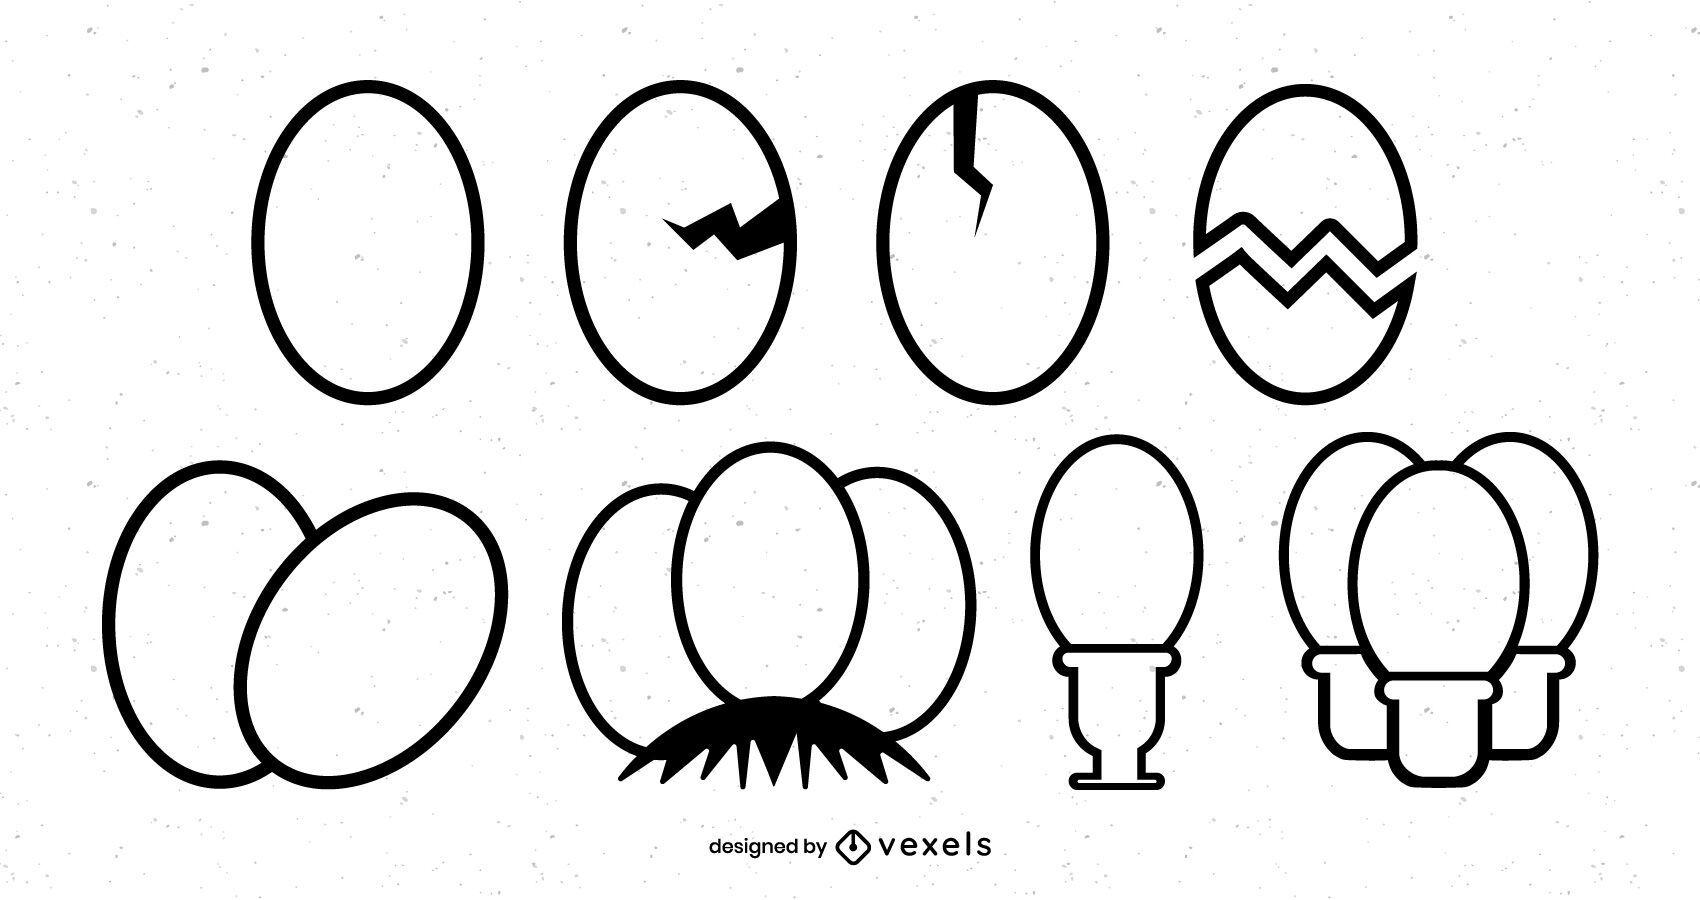 Boiled egg stroke icon set